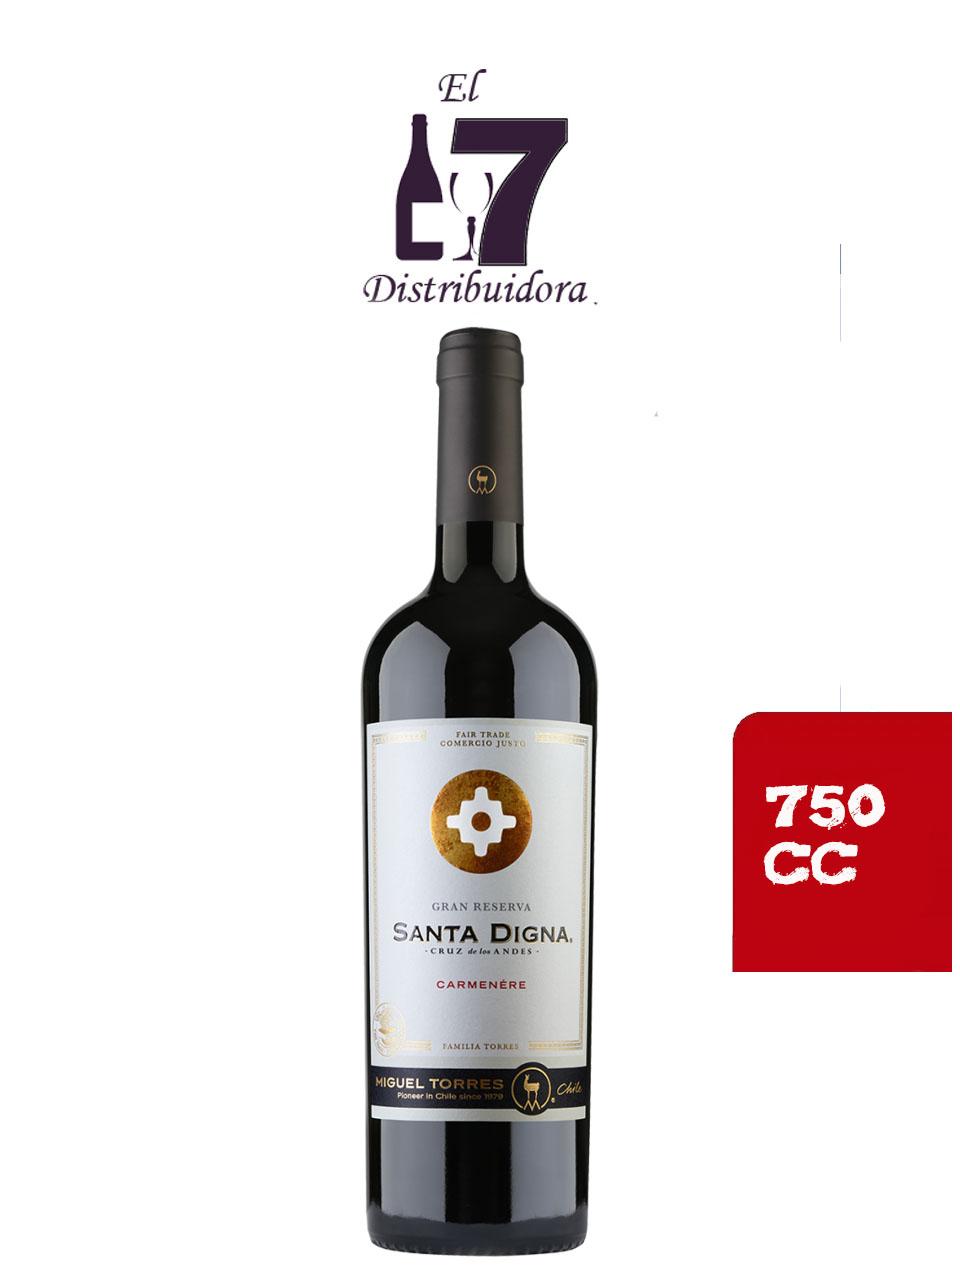 Santa Digna Gran Reserva Cabernet Sauvignon 750 CC